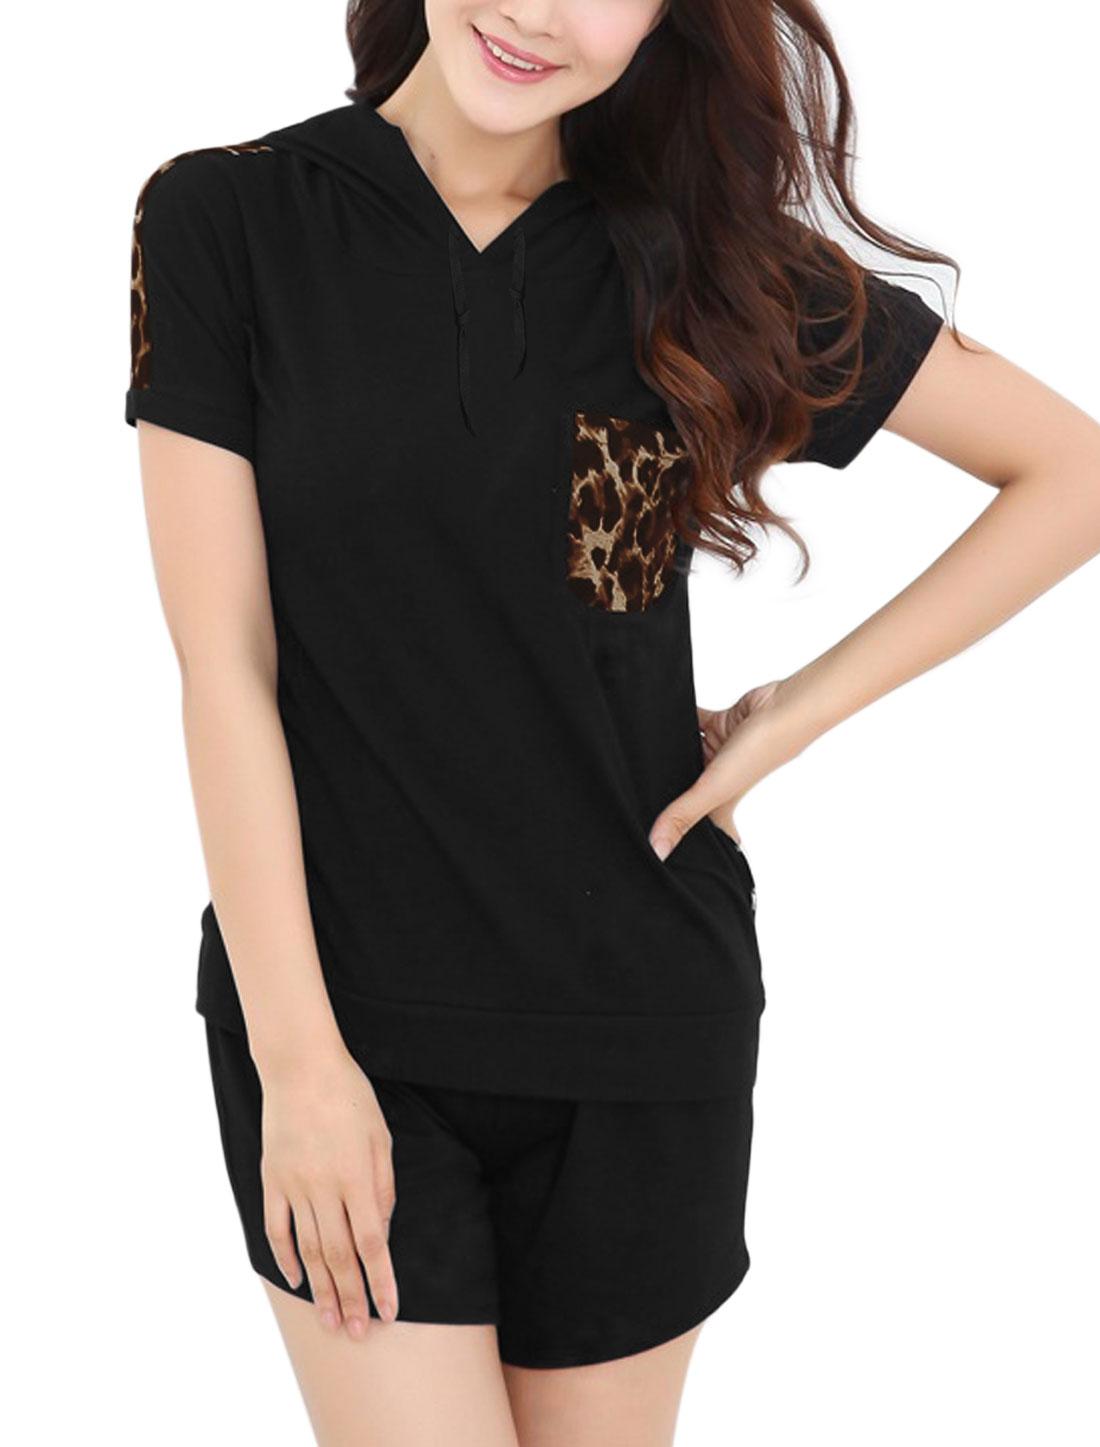 Lady Drawstring Hooded Leopard Prints Top w Elastic Waist Shorts Set Black XS